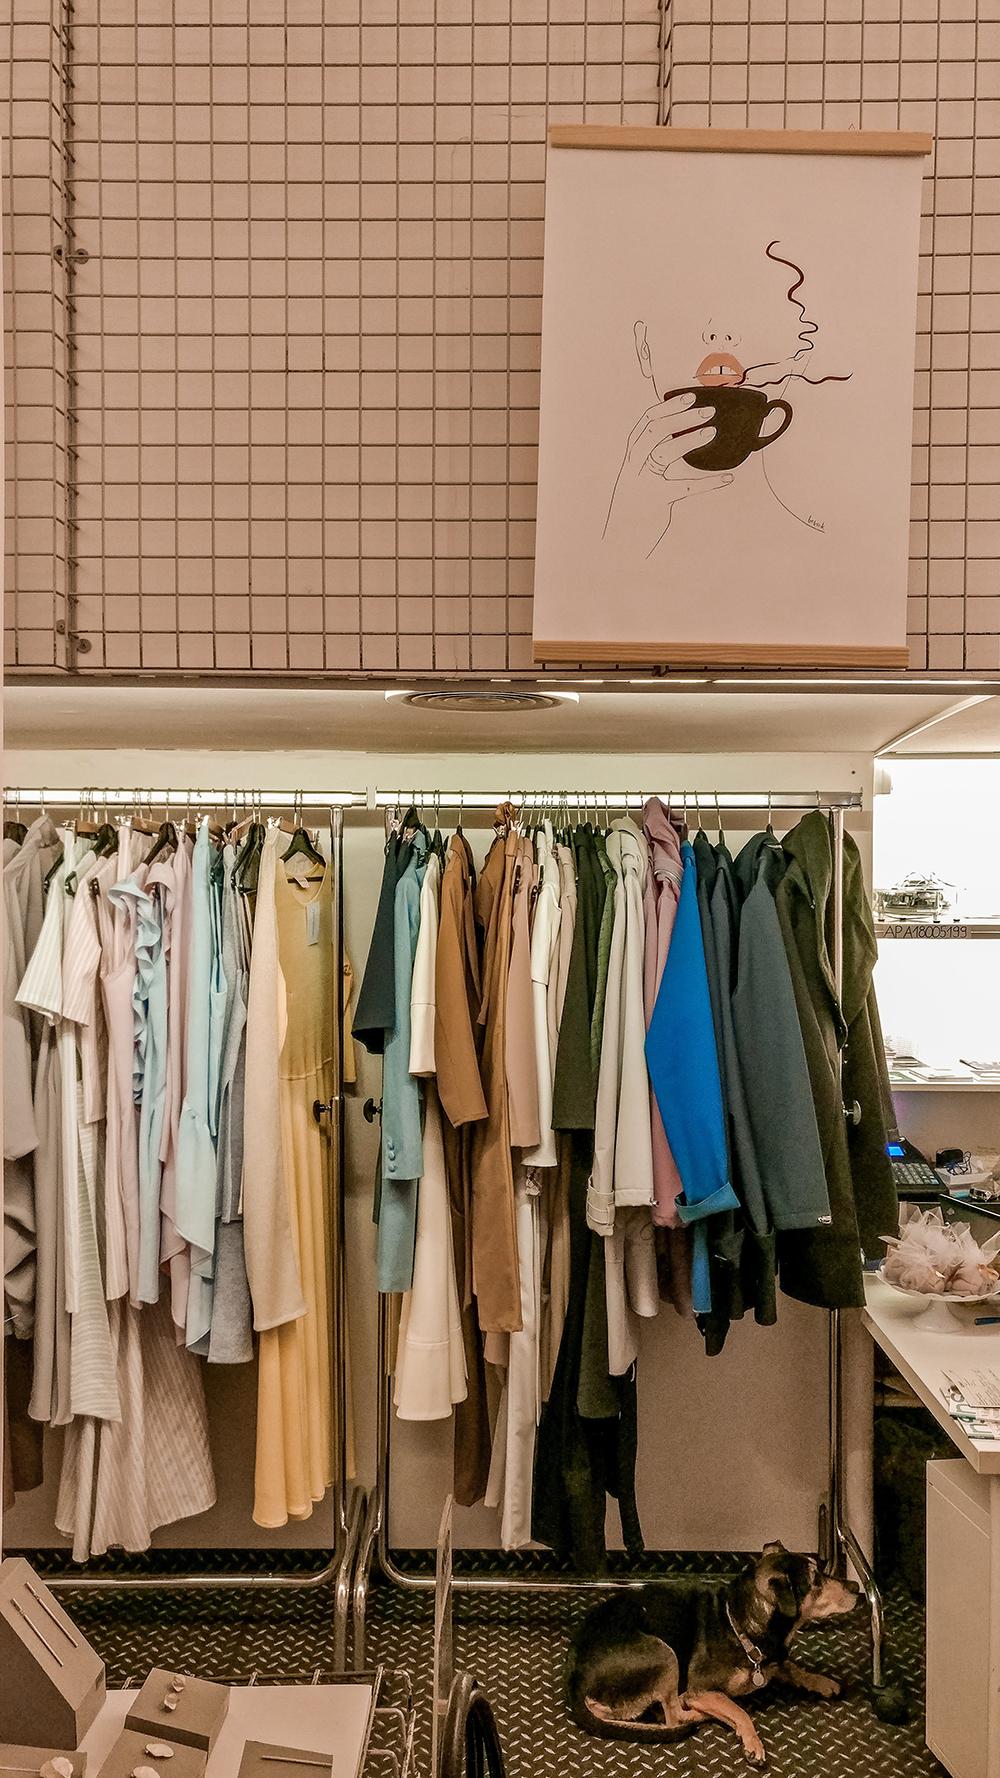 wonderLAB concept store - Budapest design shop guide to best Hungarian souvenirs | Aliz's Wonderland